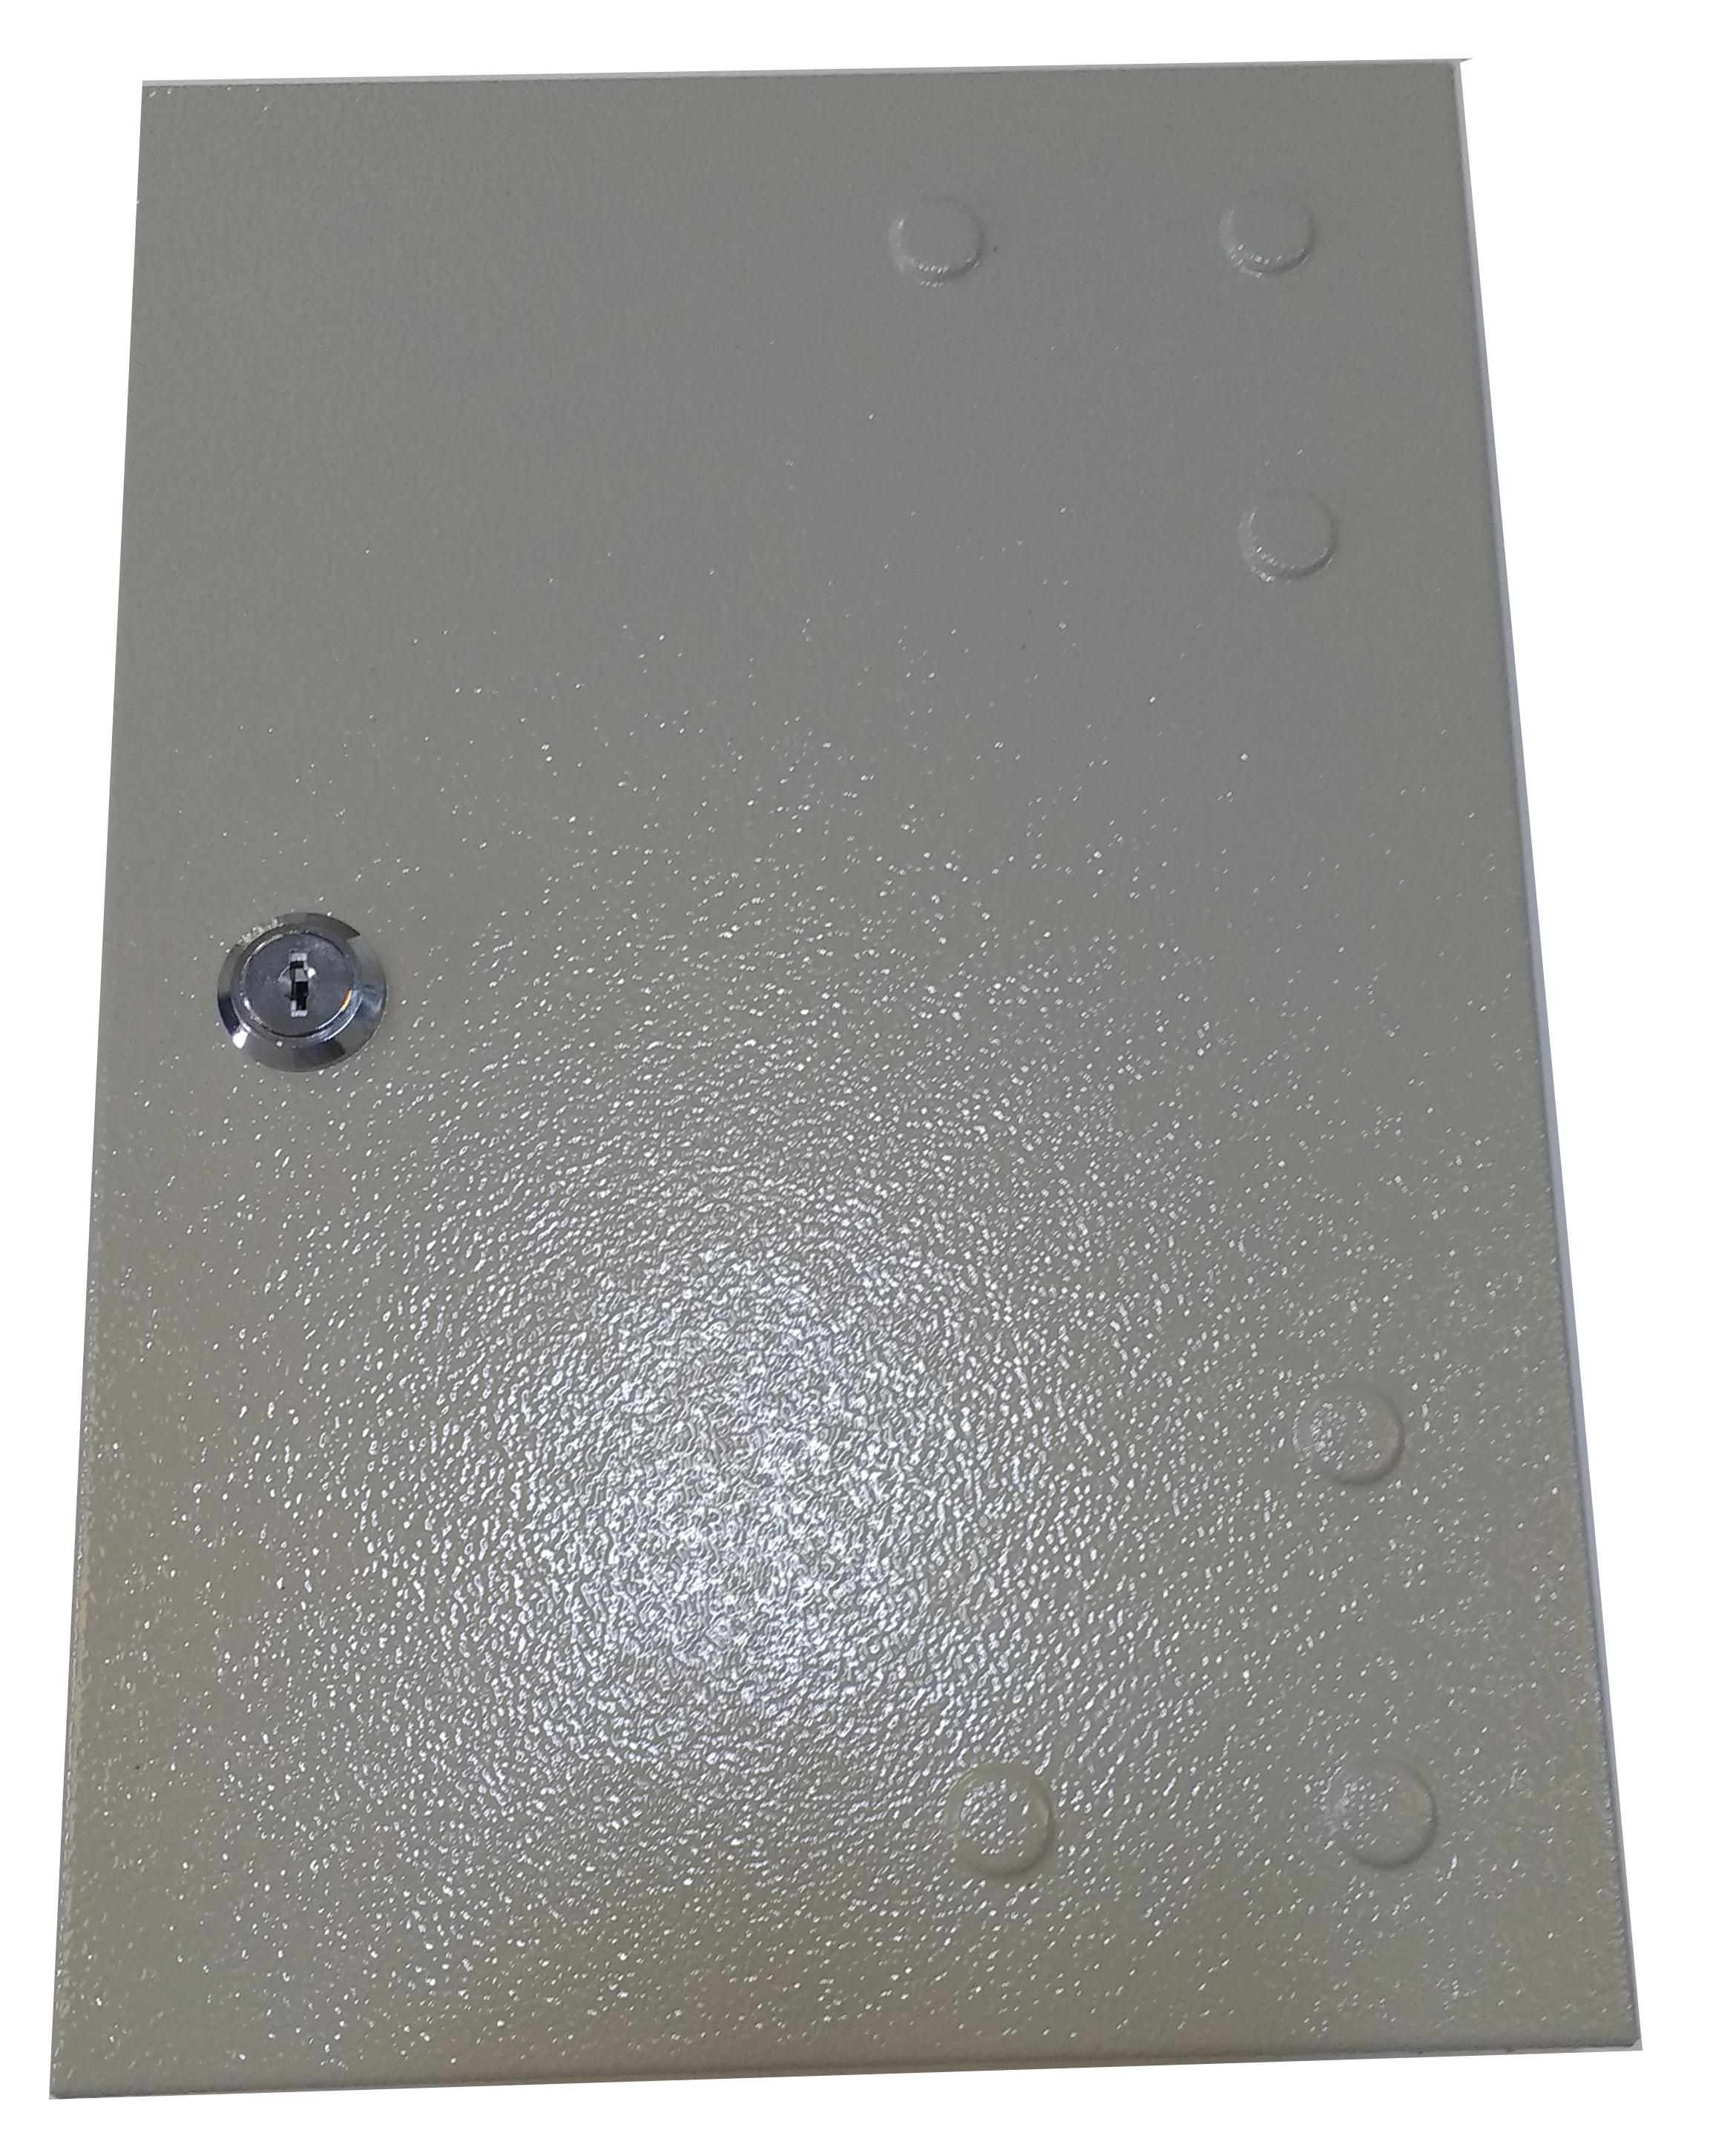 http://www.nilart.com.br/galeria/claviculario-porta-chaves-para-30-chaves-750.030-3.jpg